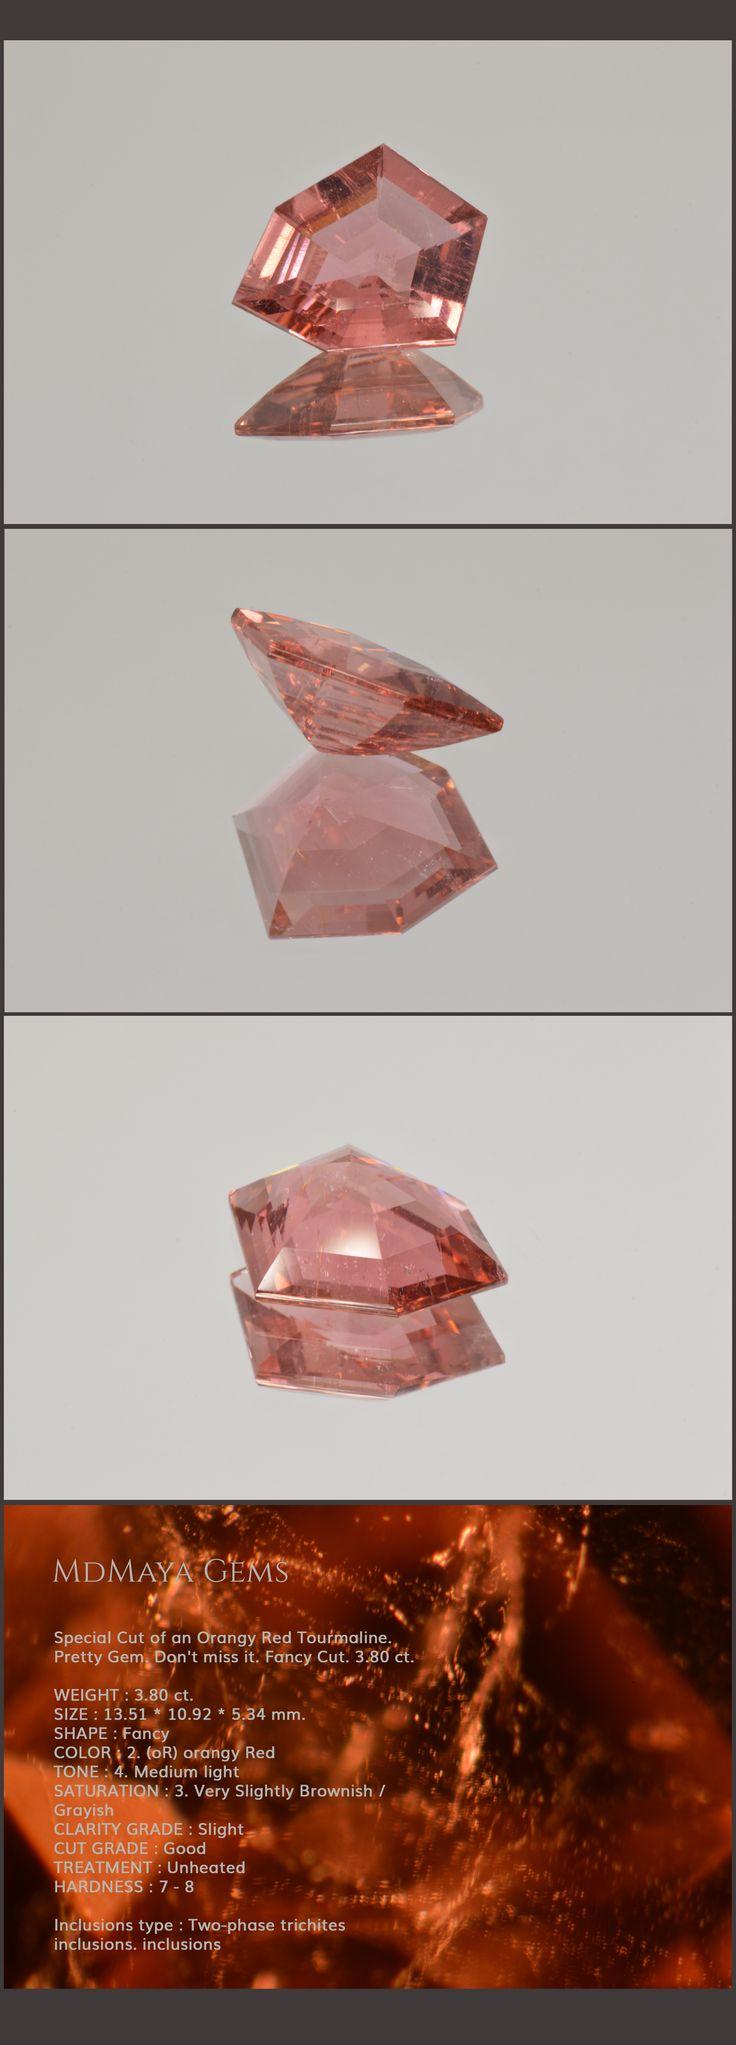 Special Cut of an Orangy Red Tourmaline. Pretty Gem. Don't miss it. Fancy Cut. 3.80 ct. Loose Tourmaline Gemstones for sale MdMaya Gems